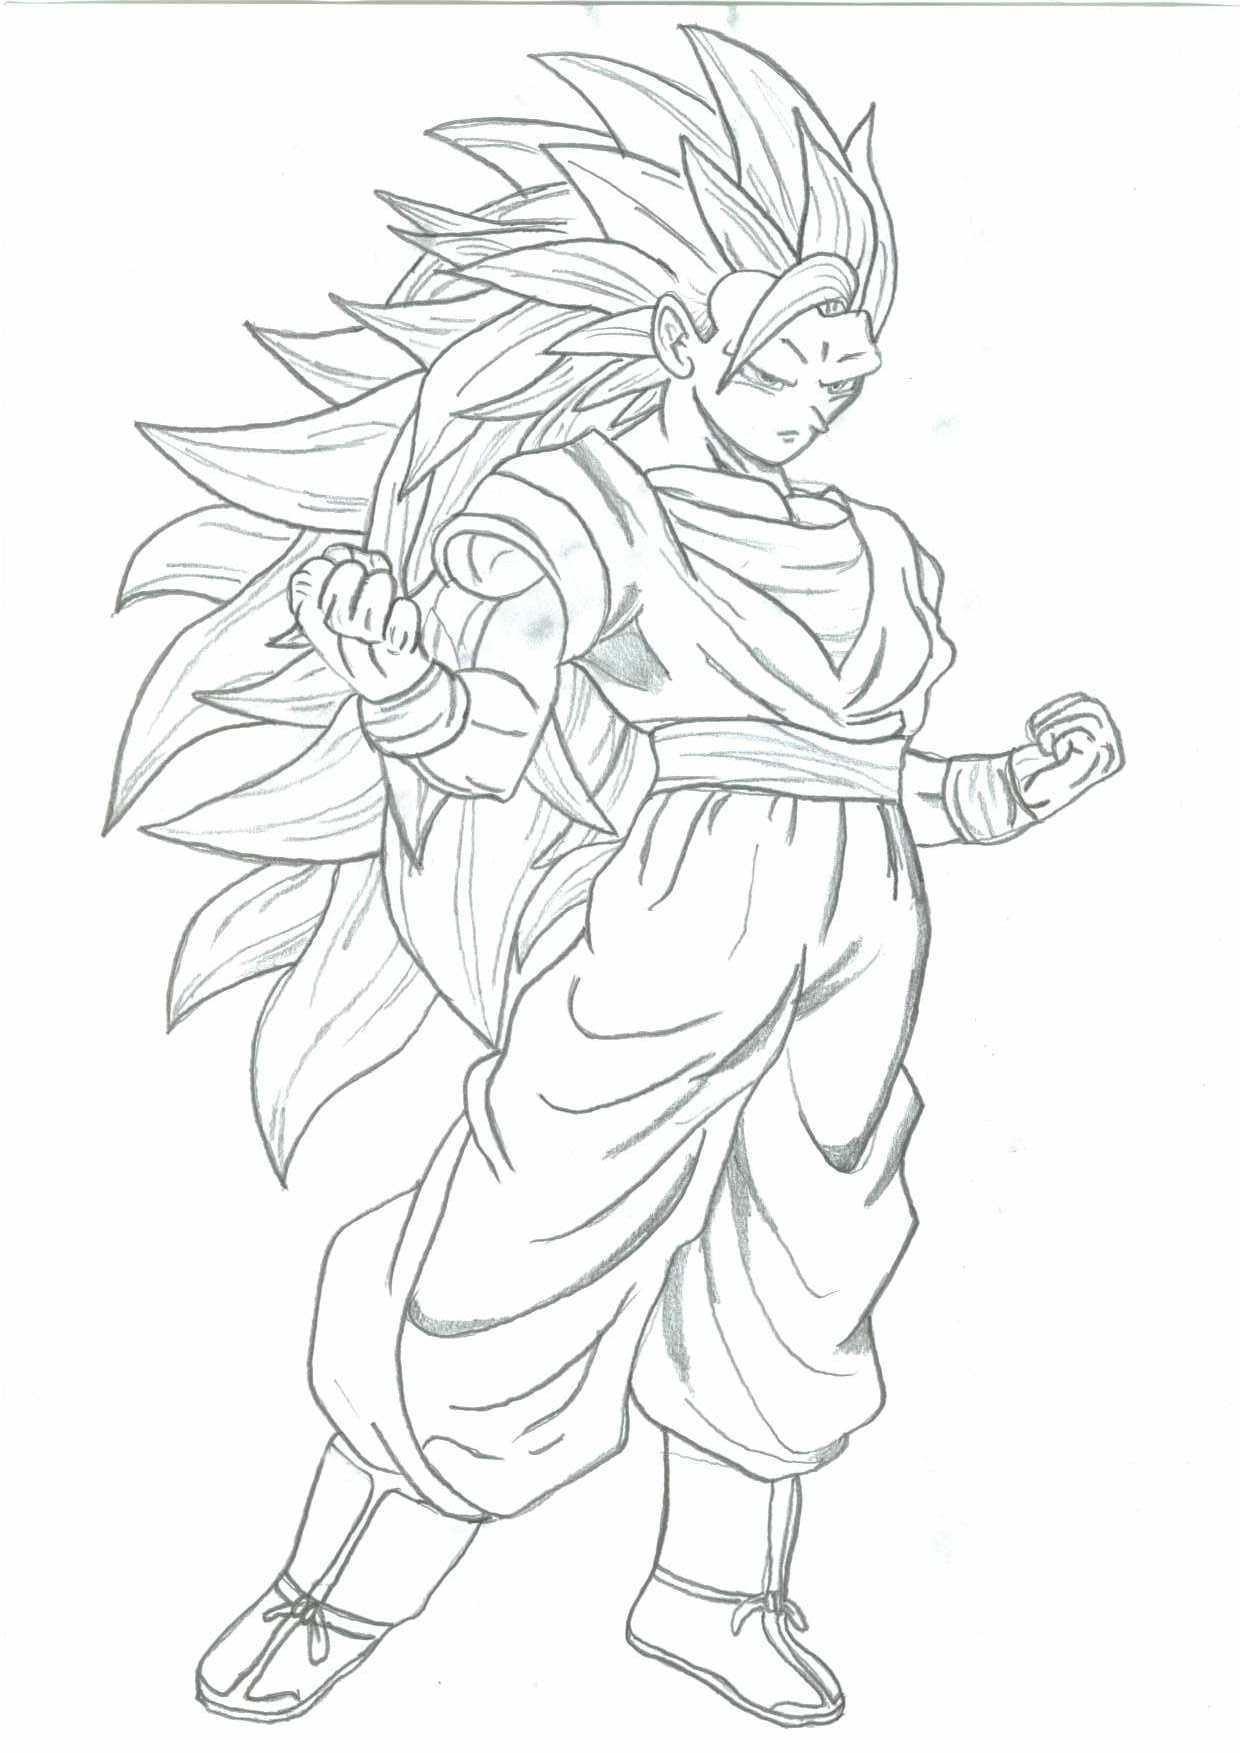 super saiyan 3 goku by shadowsabre super saiyan 3 goku by shadowsabre